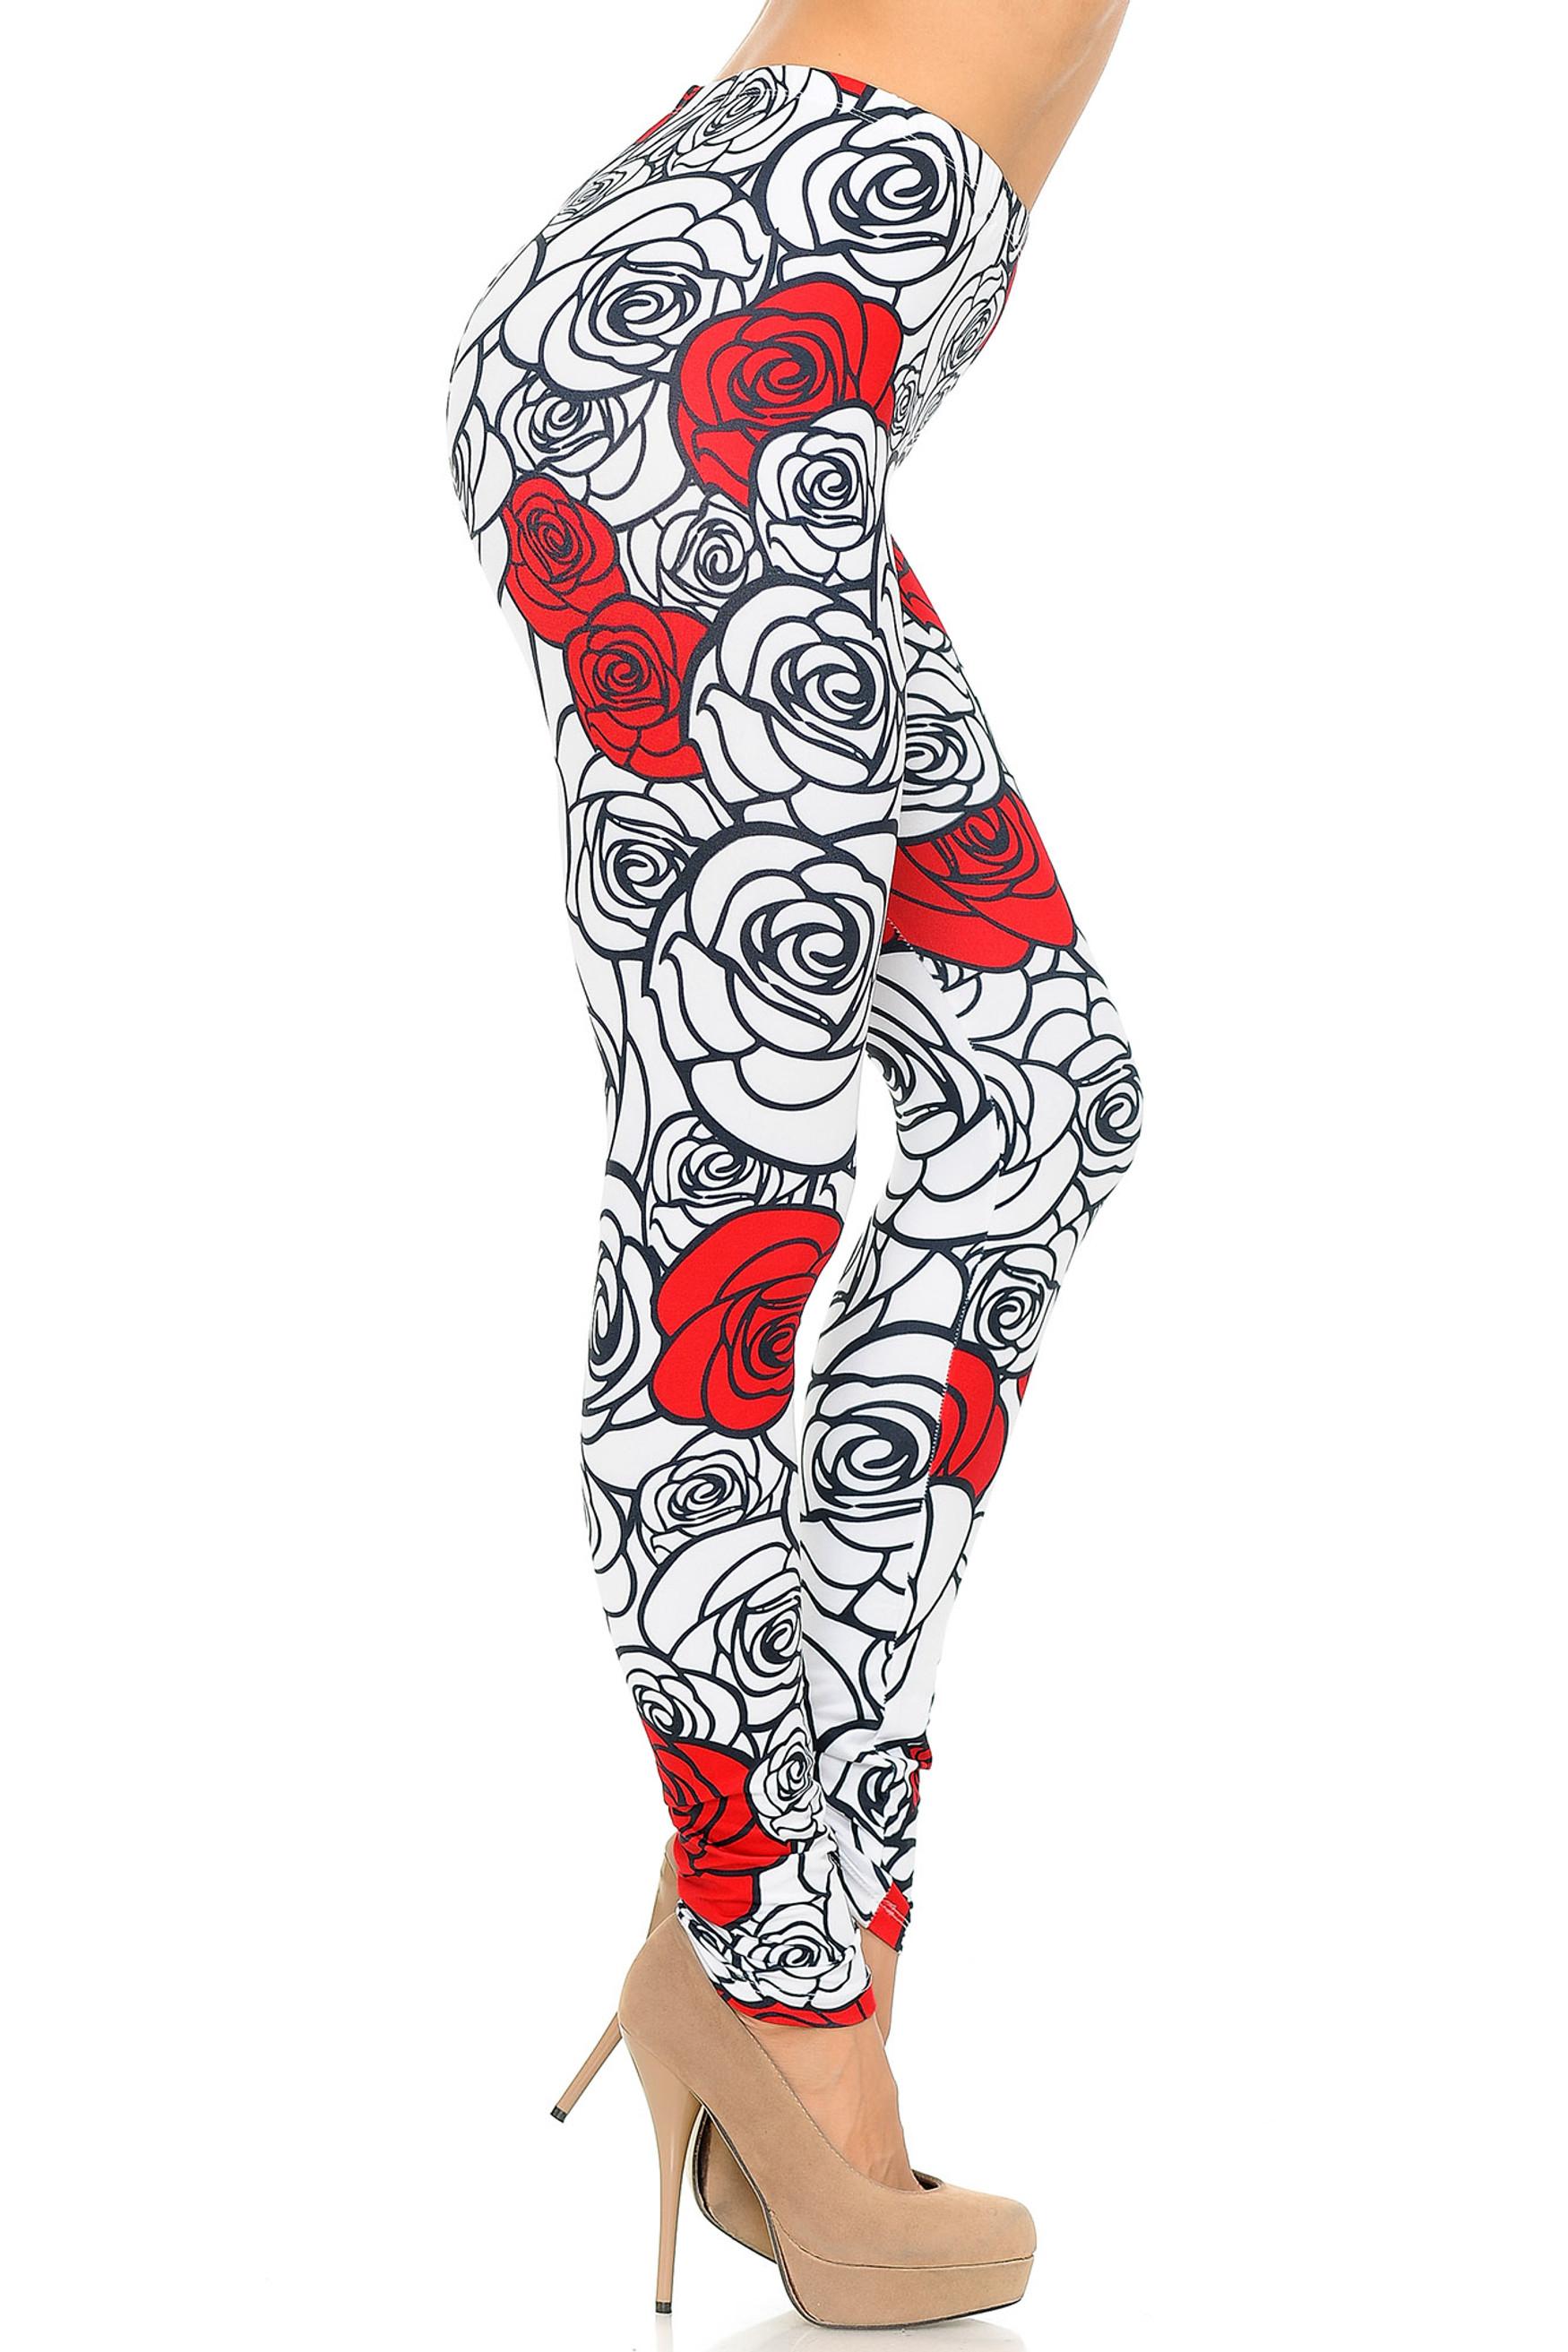 Creamy Soft Red Stencil Roses Extra Small Leggings - USA Fashion™